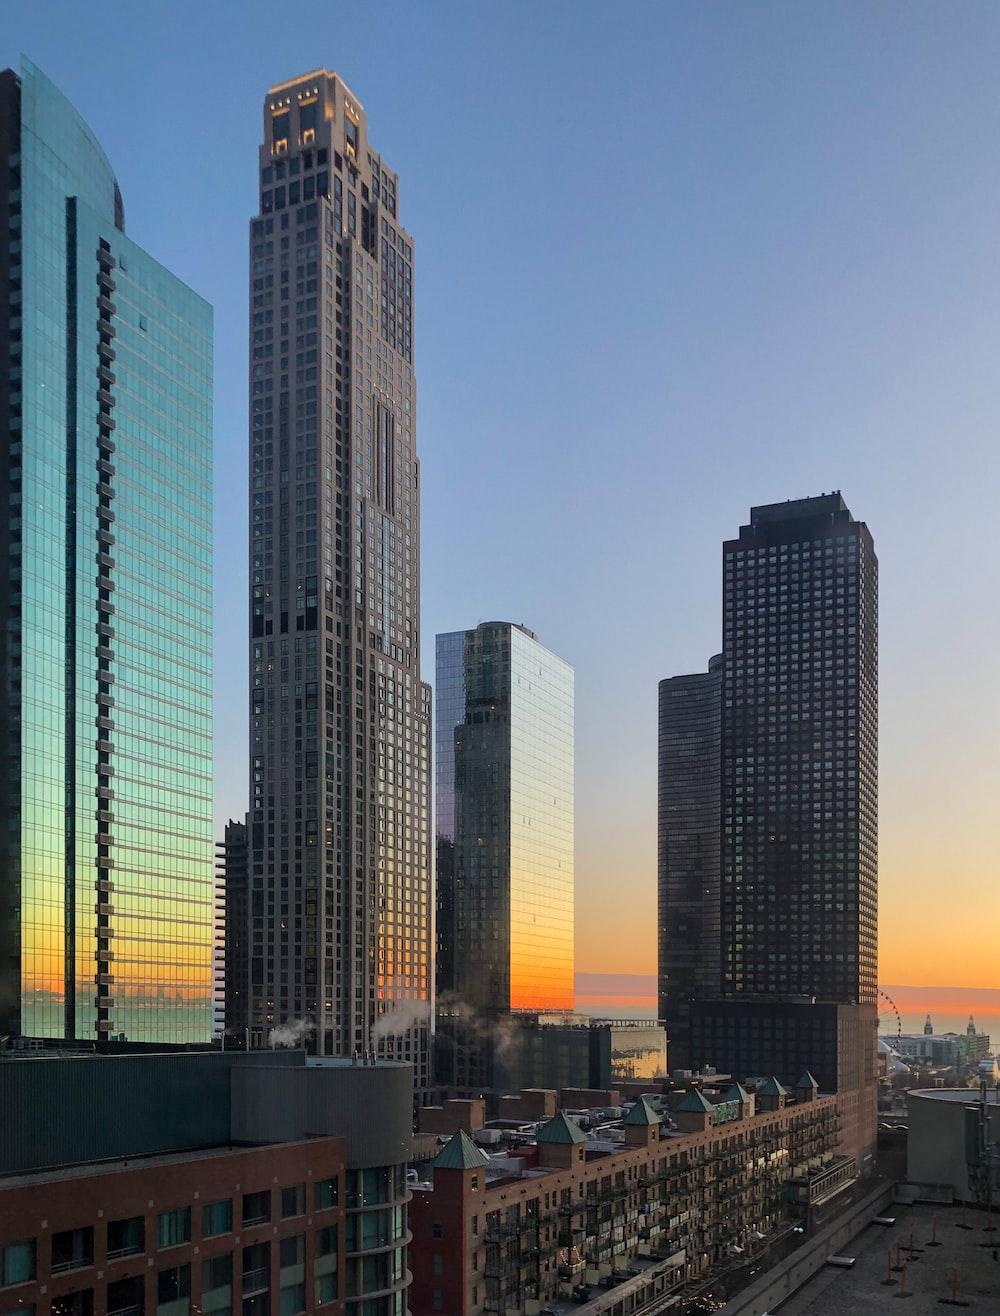 brown concrete high-rise buildings